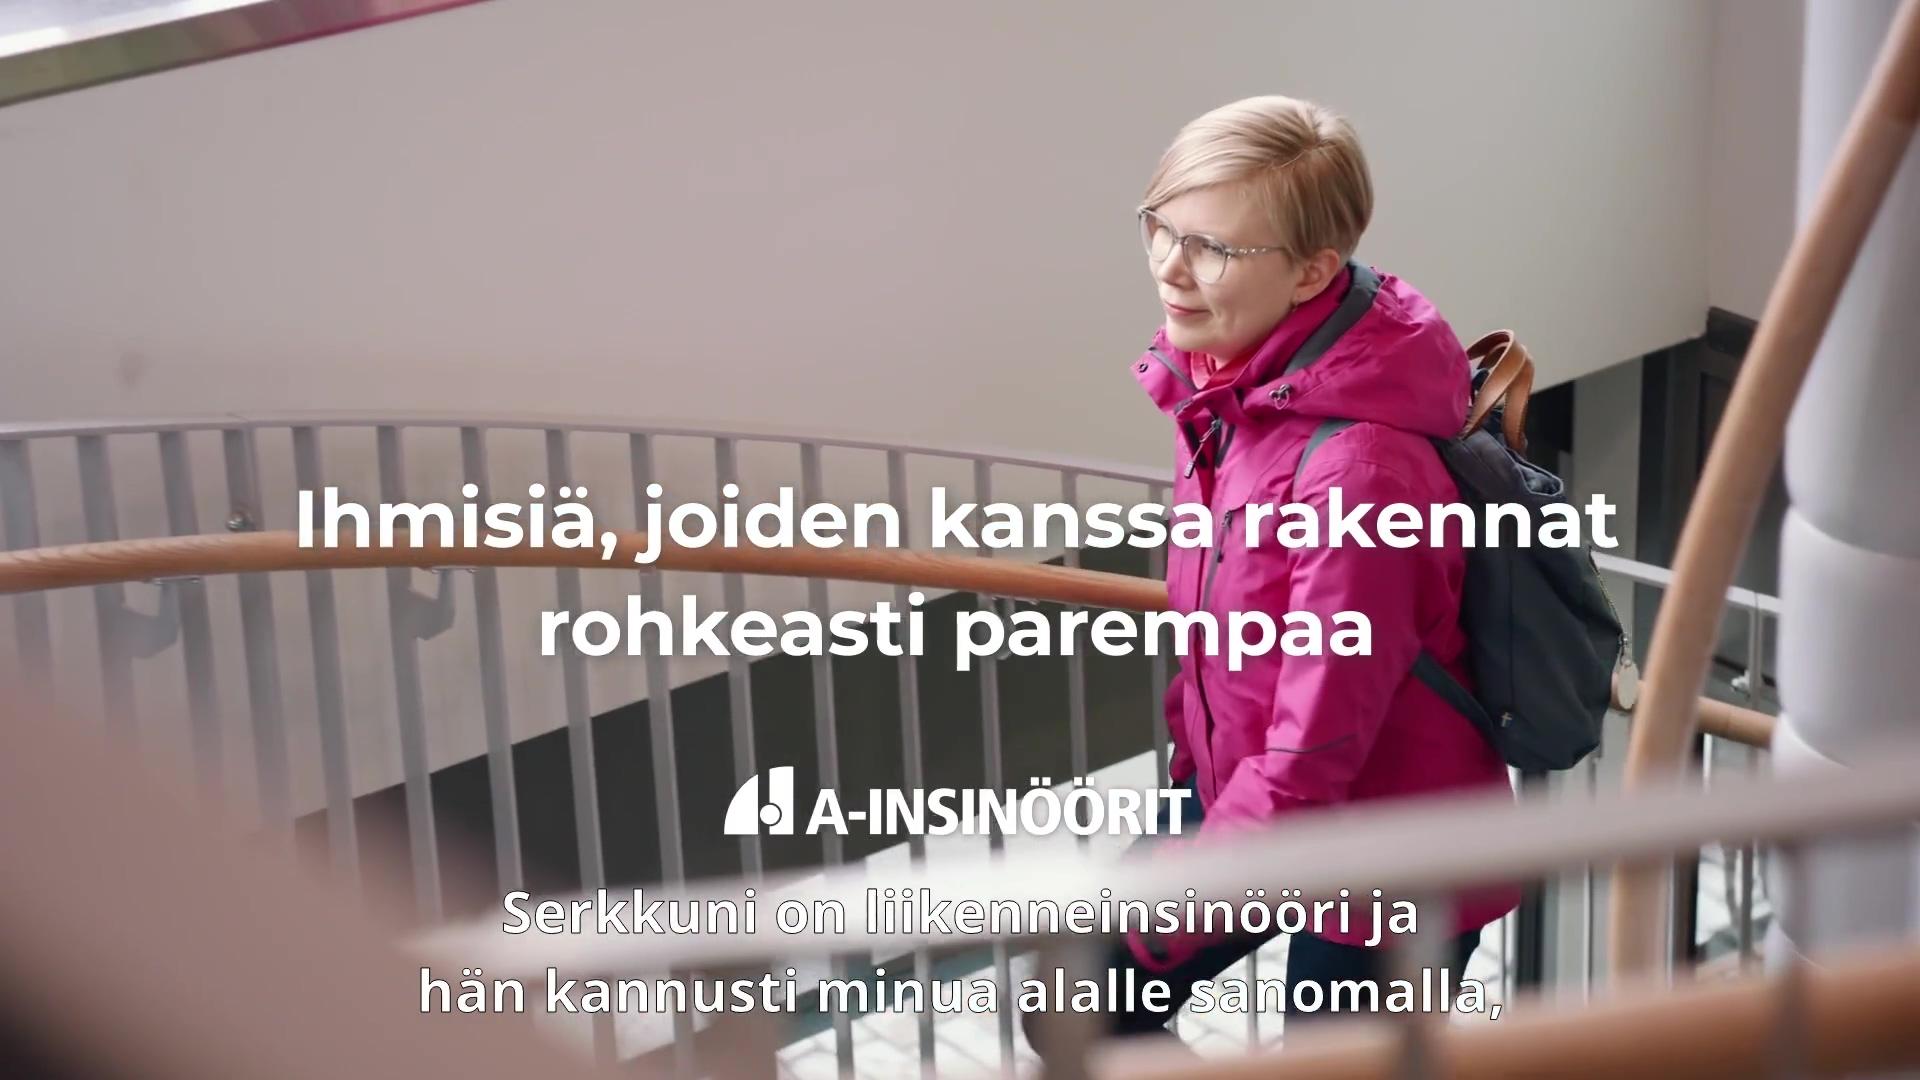 A-Insinoorit_Merkkipaaluja-1920x1080_Piritta-Laitakari